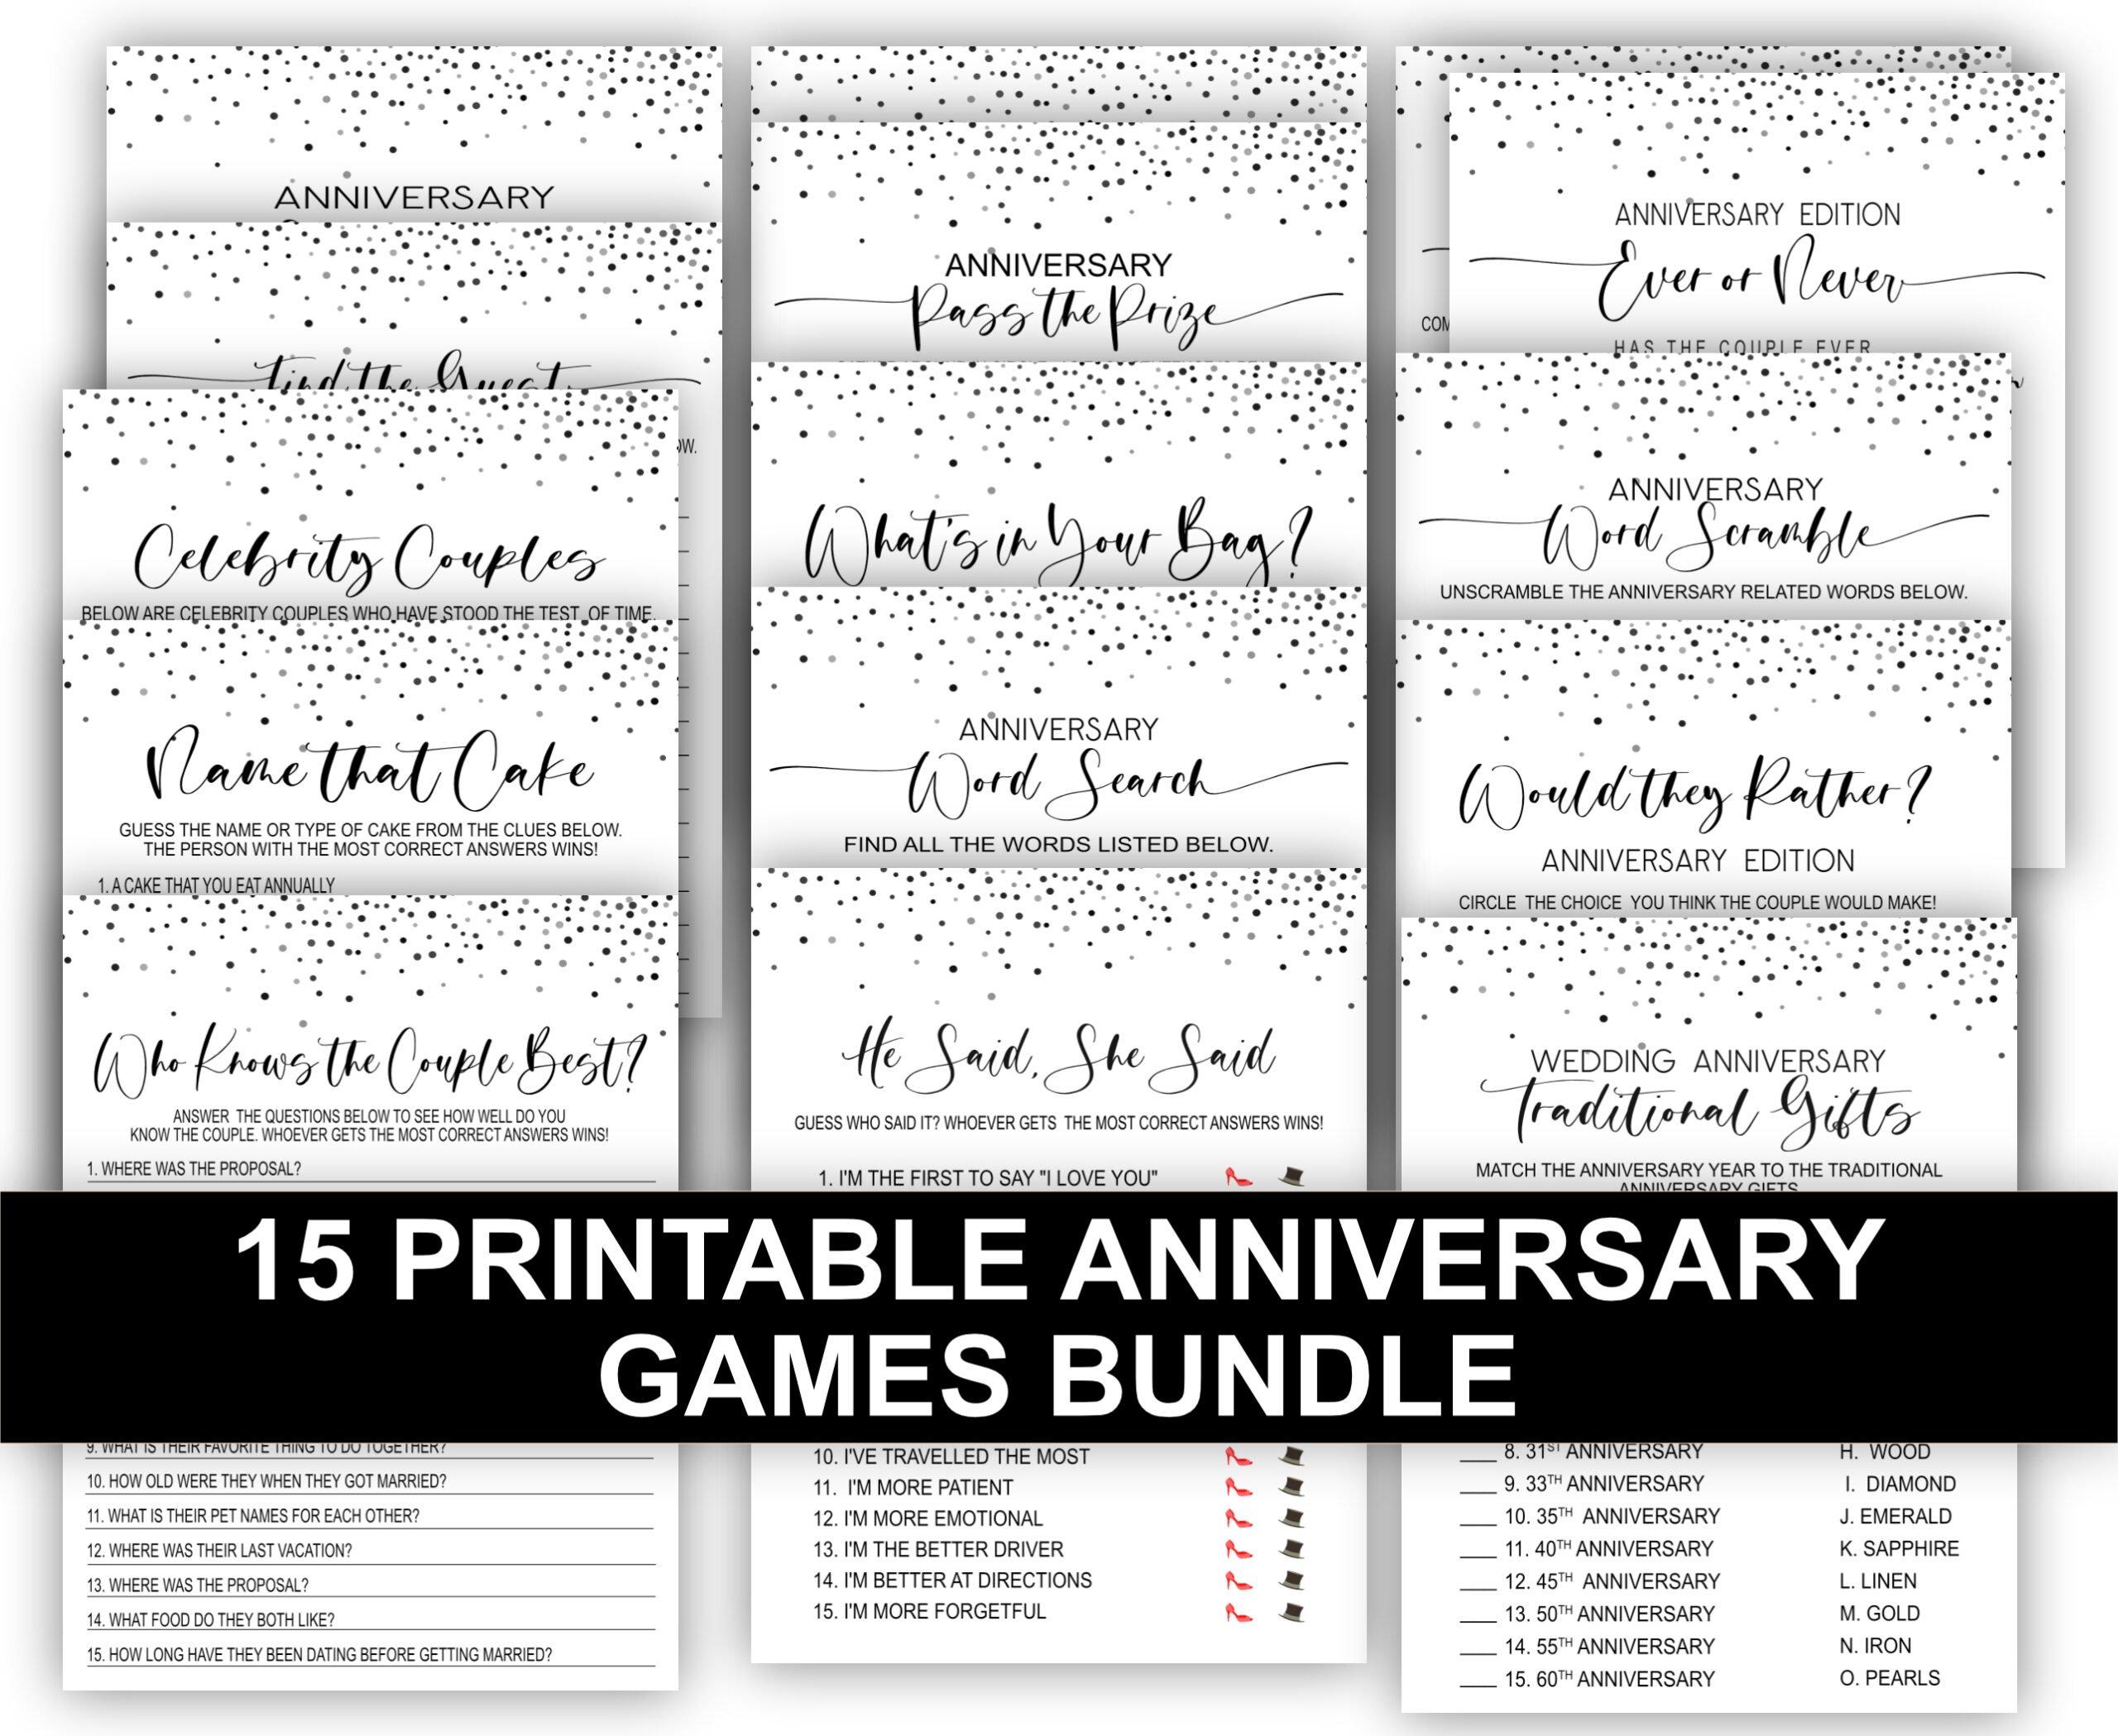 ANNIVERSARY GAMES 15-1 Anniversary Games Bundle Pack 10th